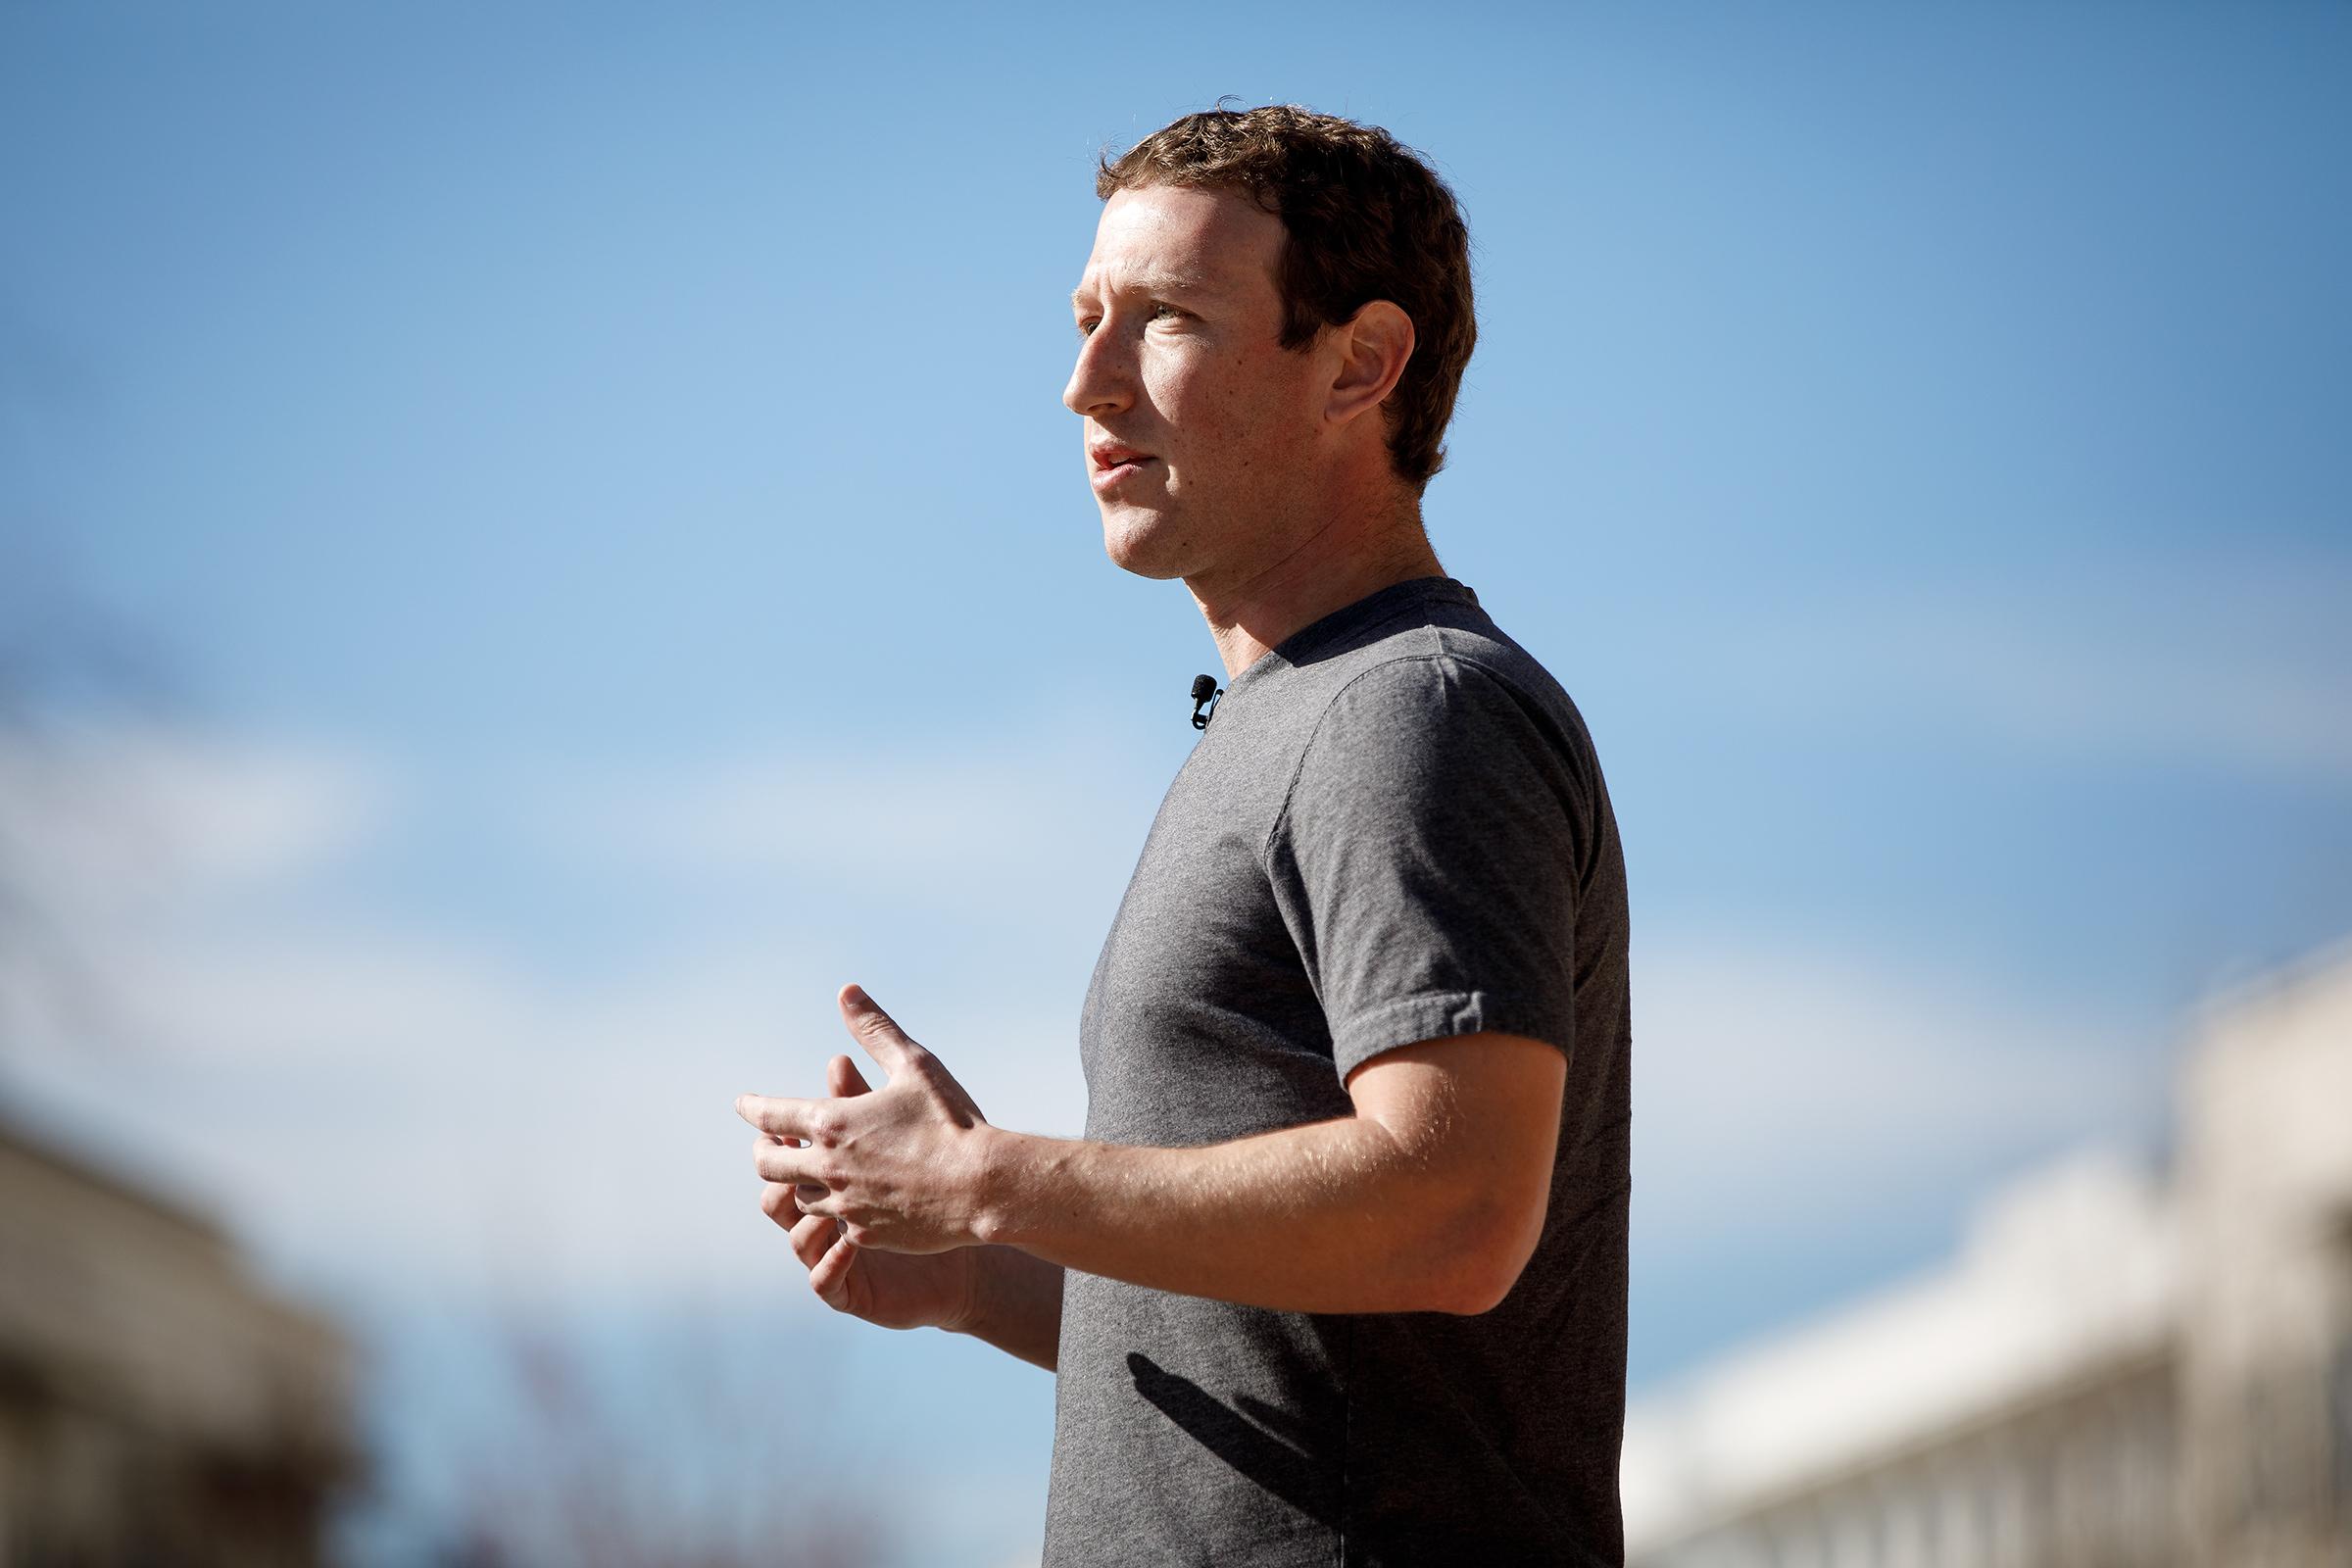 Facebooks First President On Facebook >> Facebook S Mark Zuckerberg Wrote A 6 000 Word Letter Addressing Fake